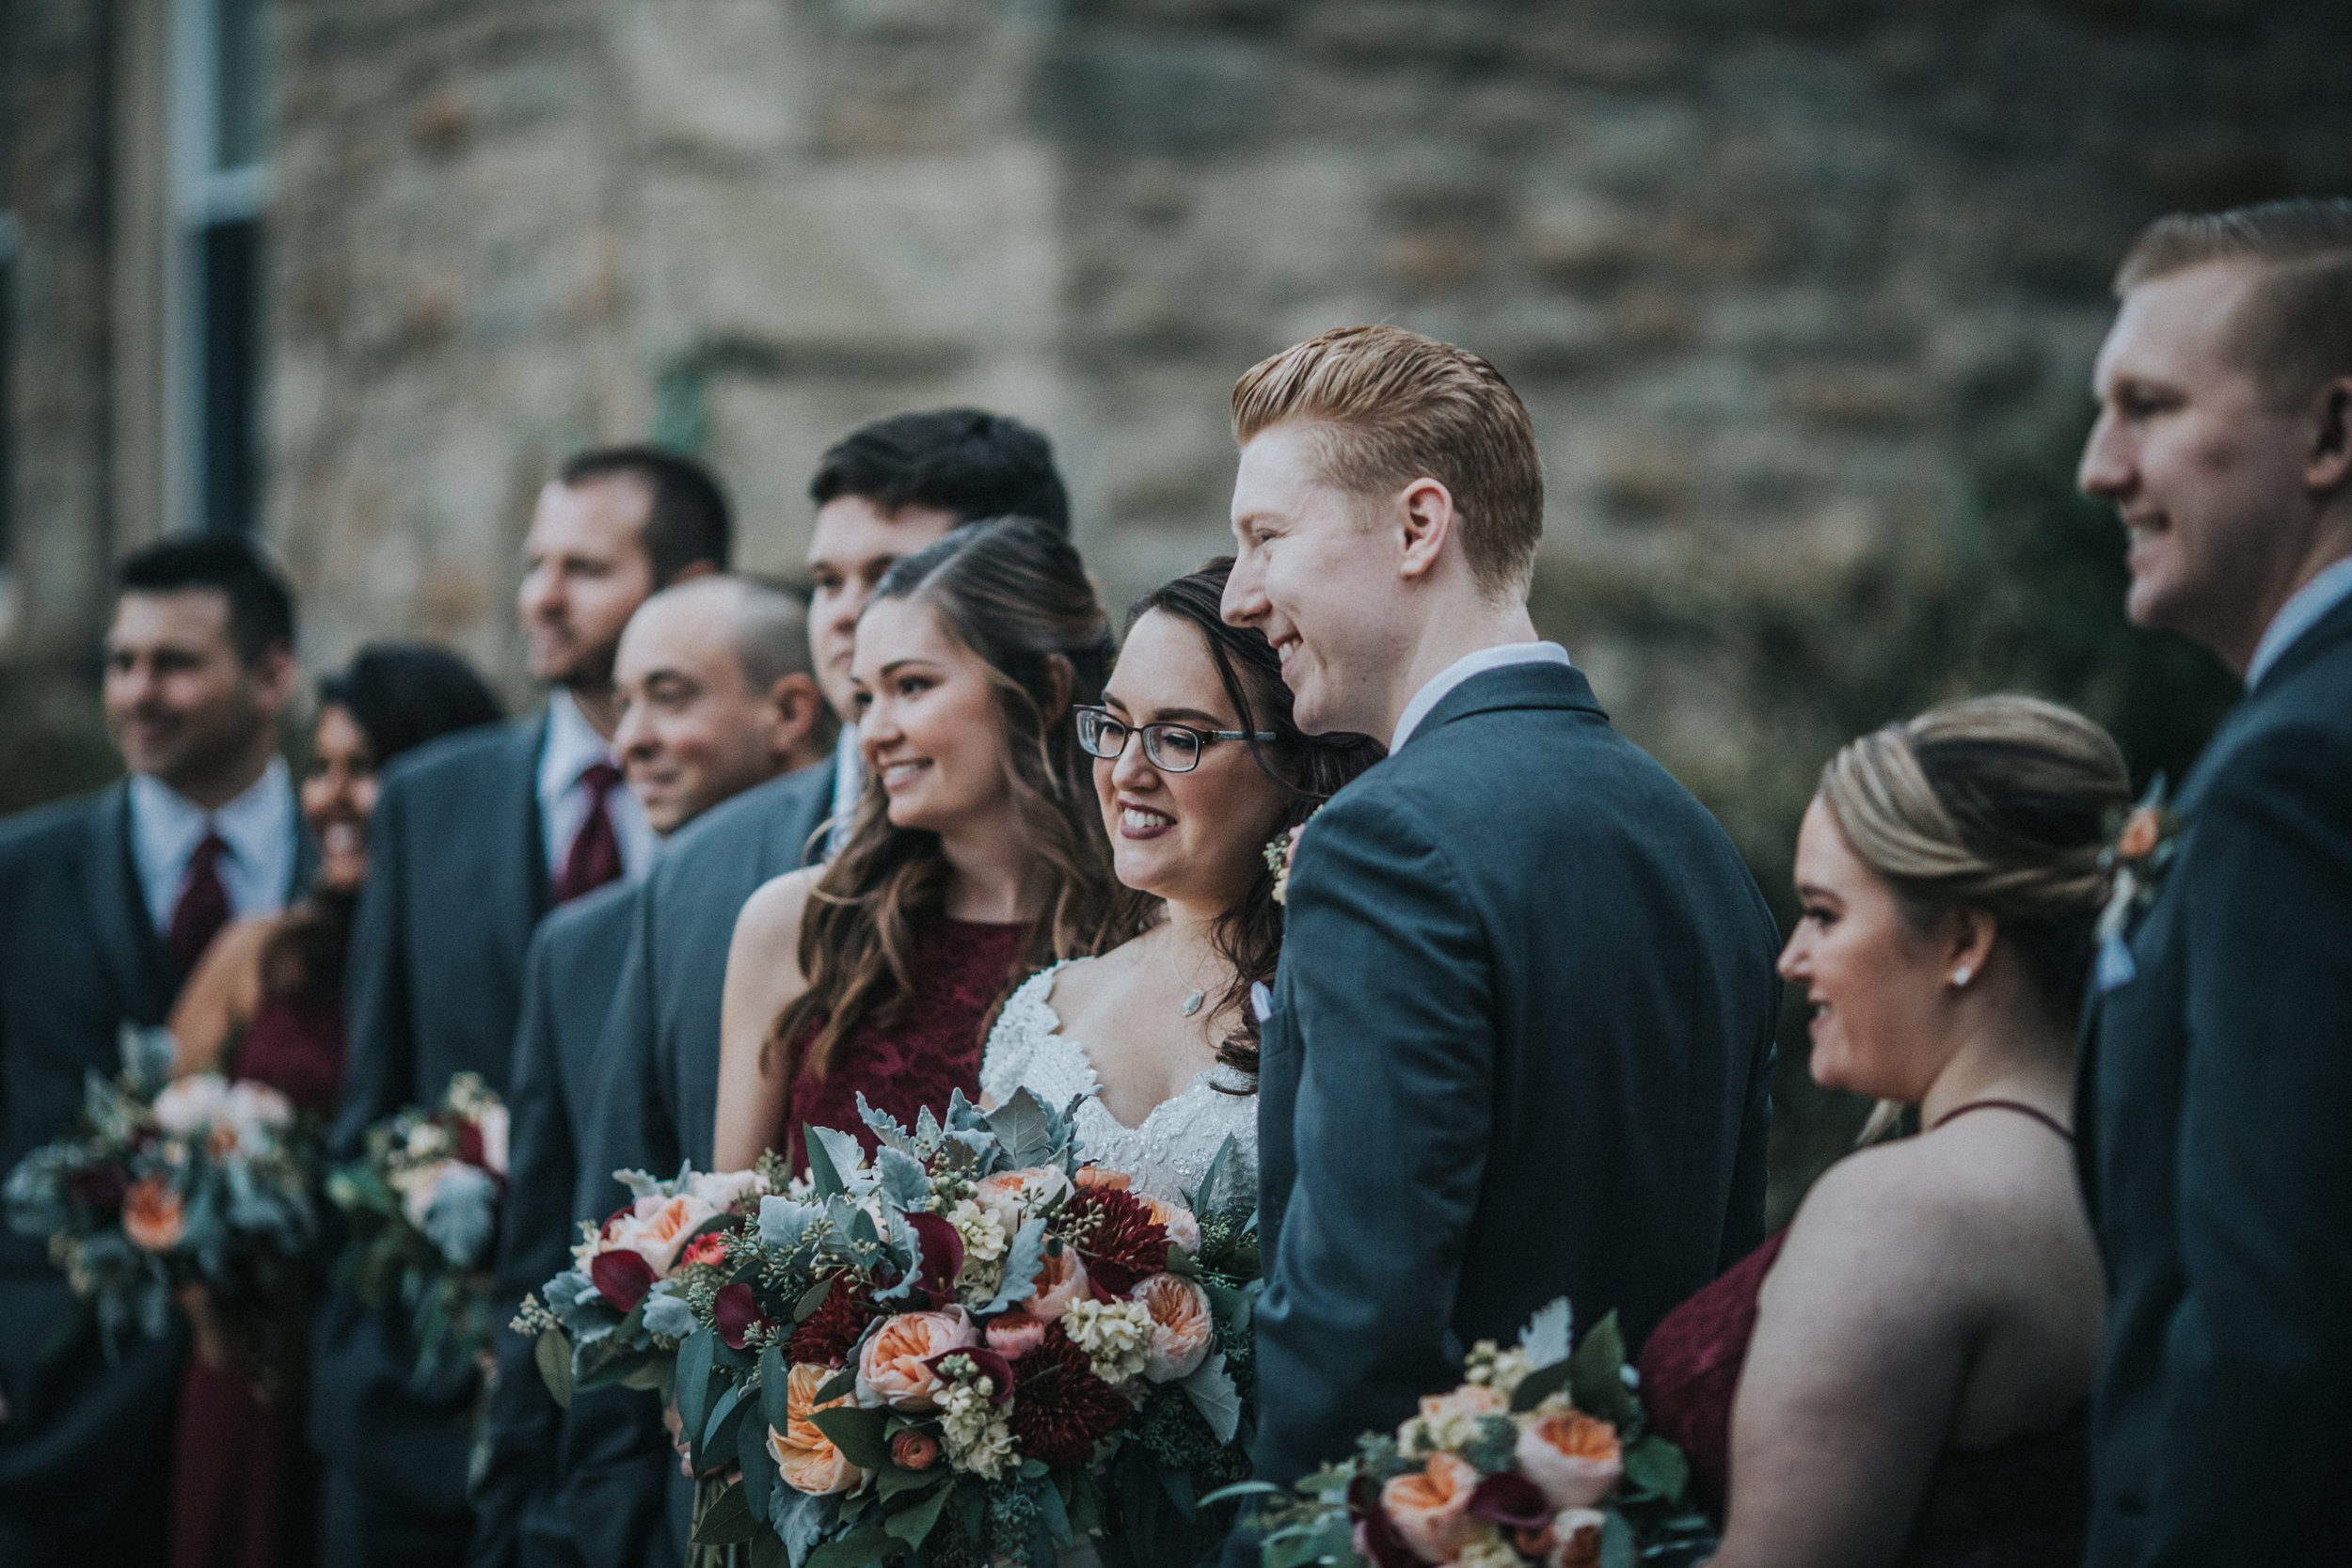 New-Jersey-Wedding-Photography-Fishers-Tudor-House-JennaLynnPhotography-BridalParty-Kathleen&Eddie-29.jpg